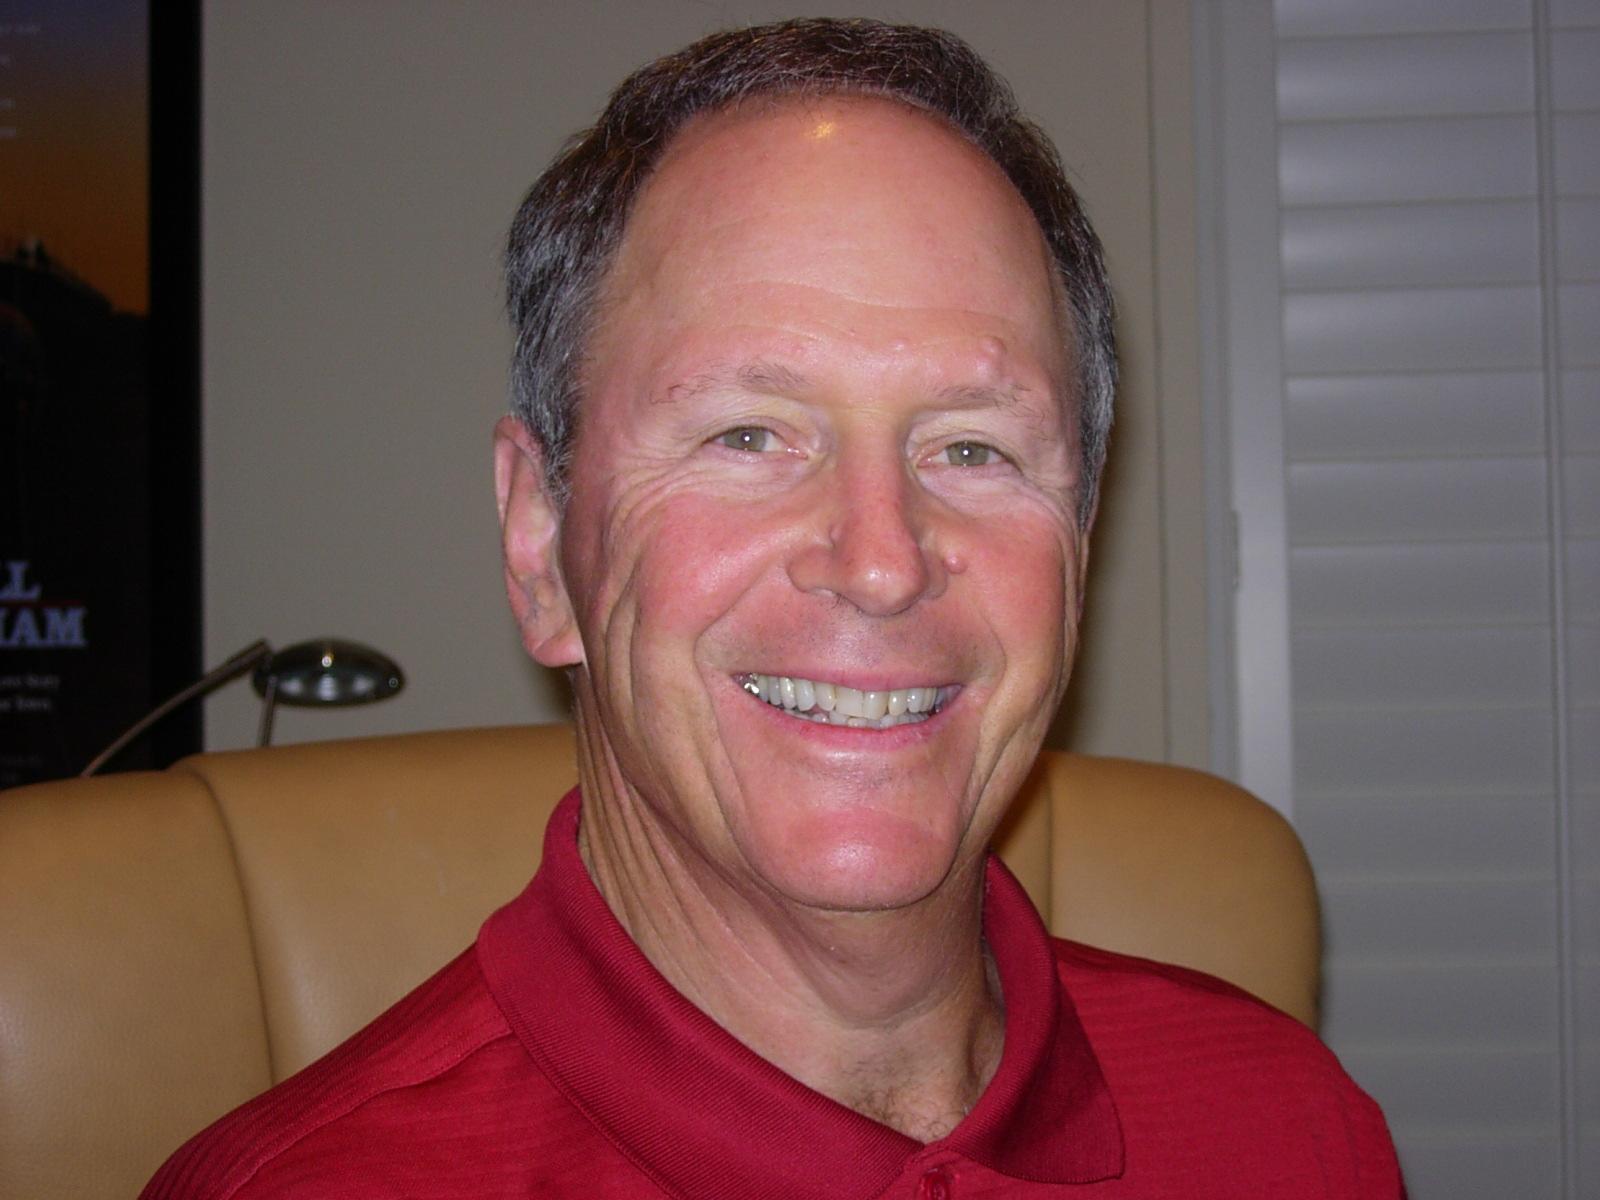 Mr. Bill Weinberger